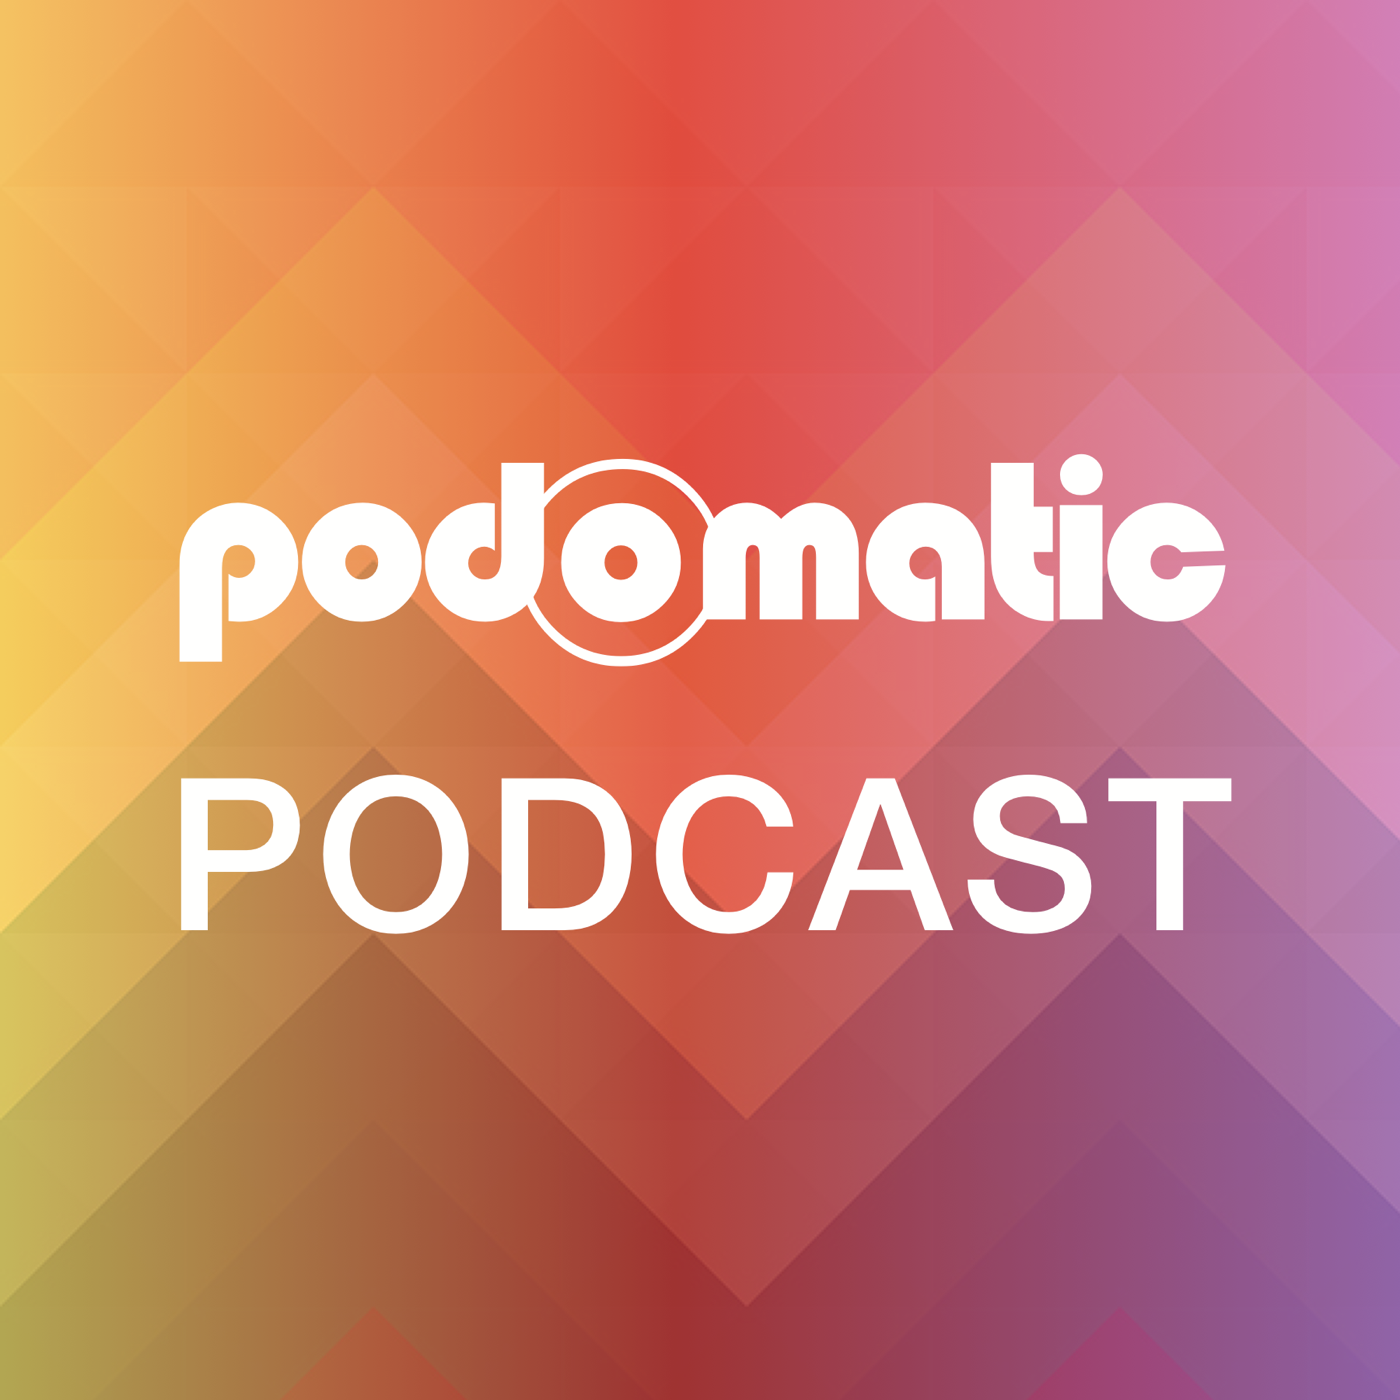 mcrgloballive4wkend's Podcast